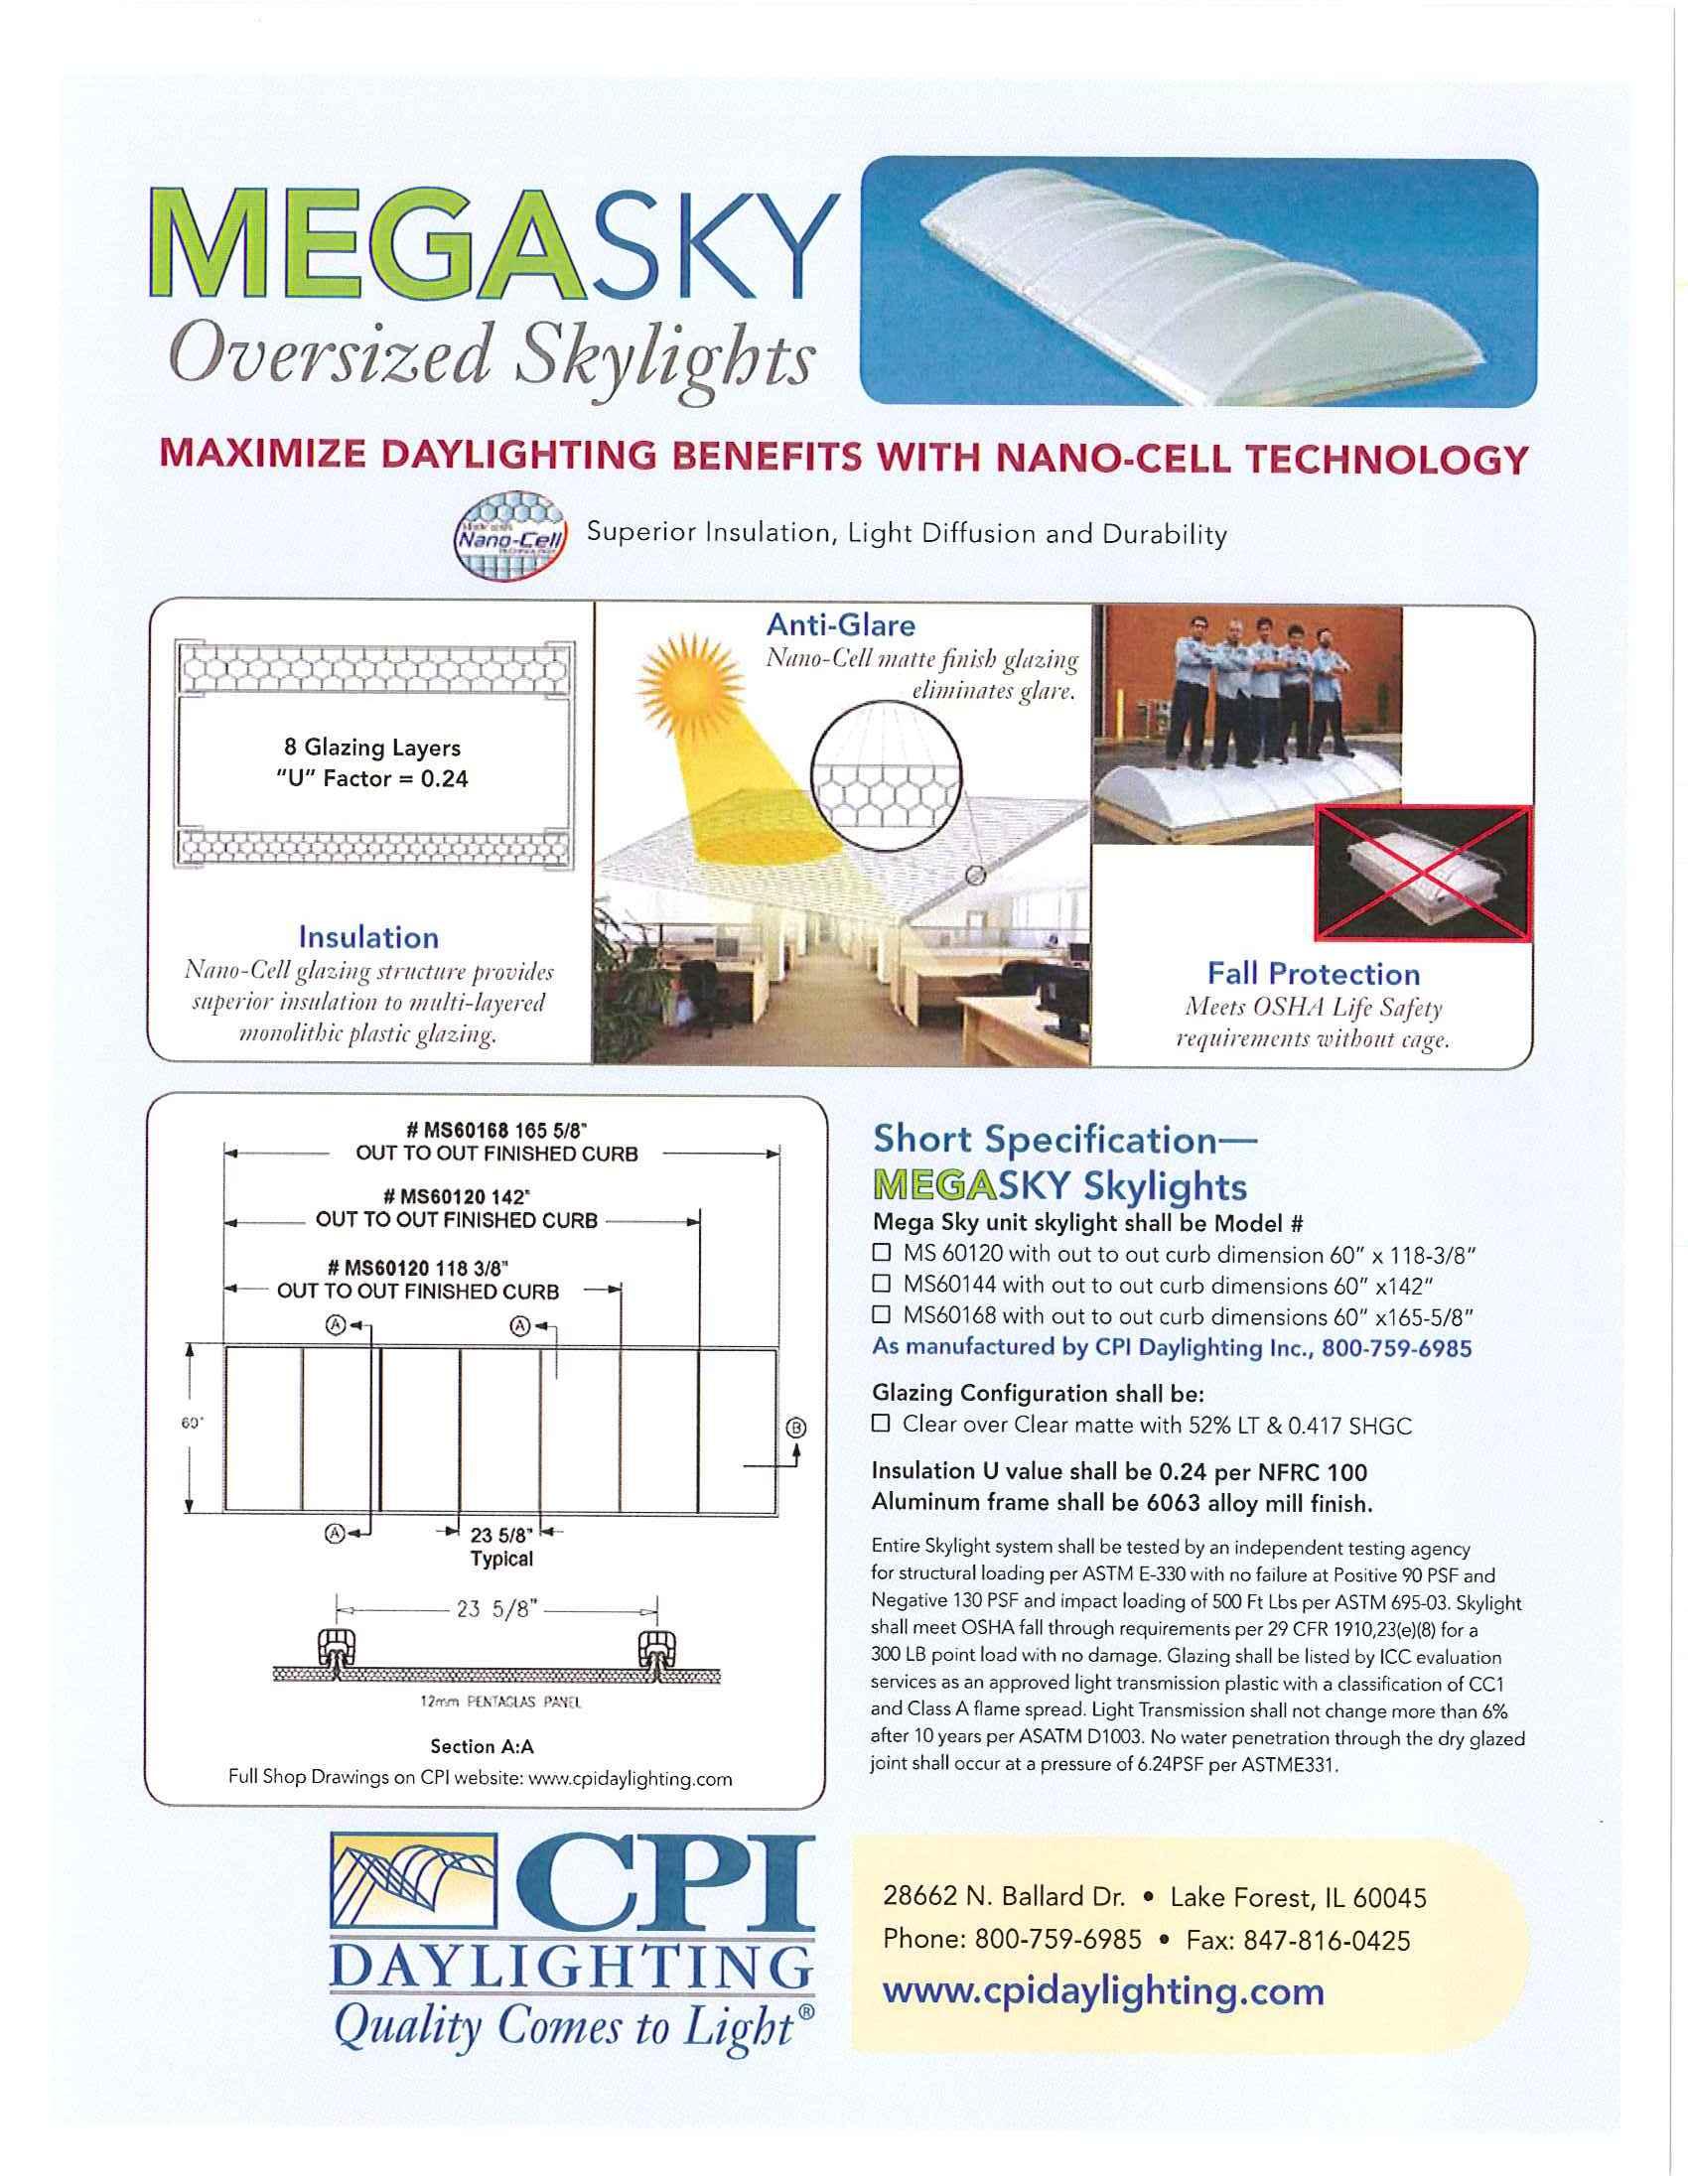 CPI MegaSky skylights maximize daylighting benefits with nano-cell technology.